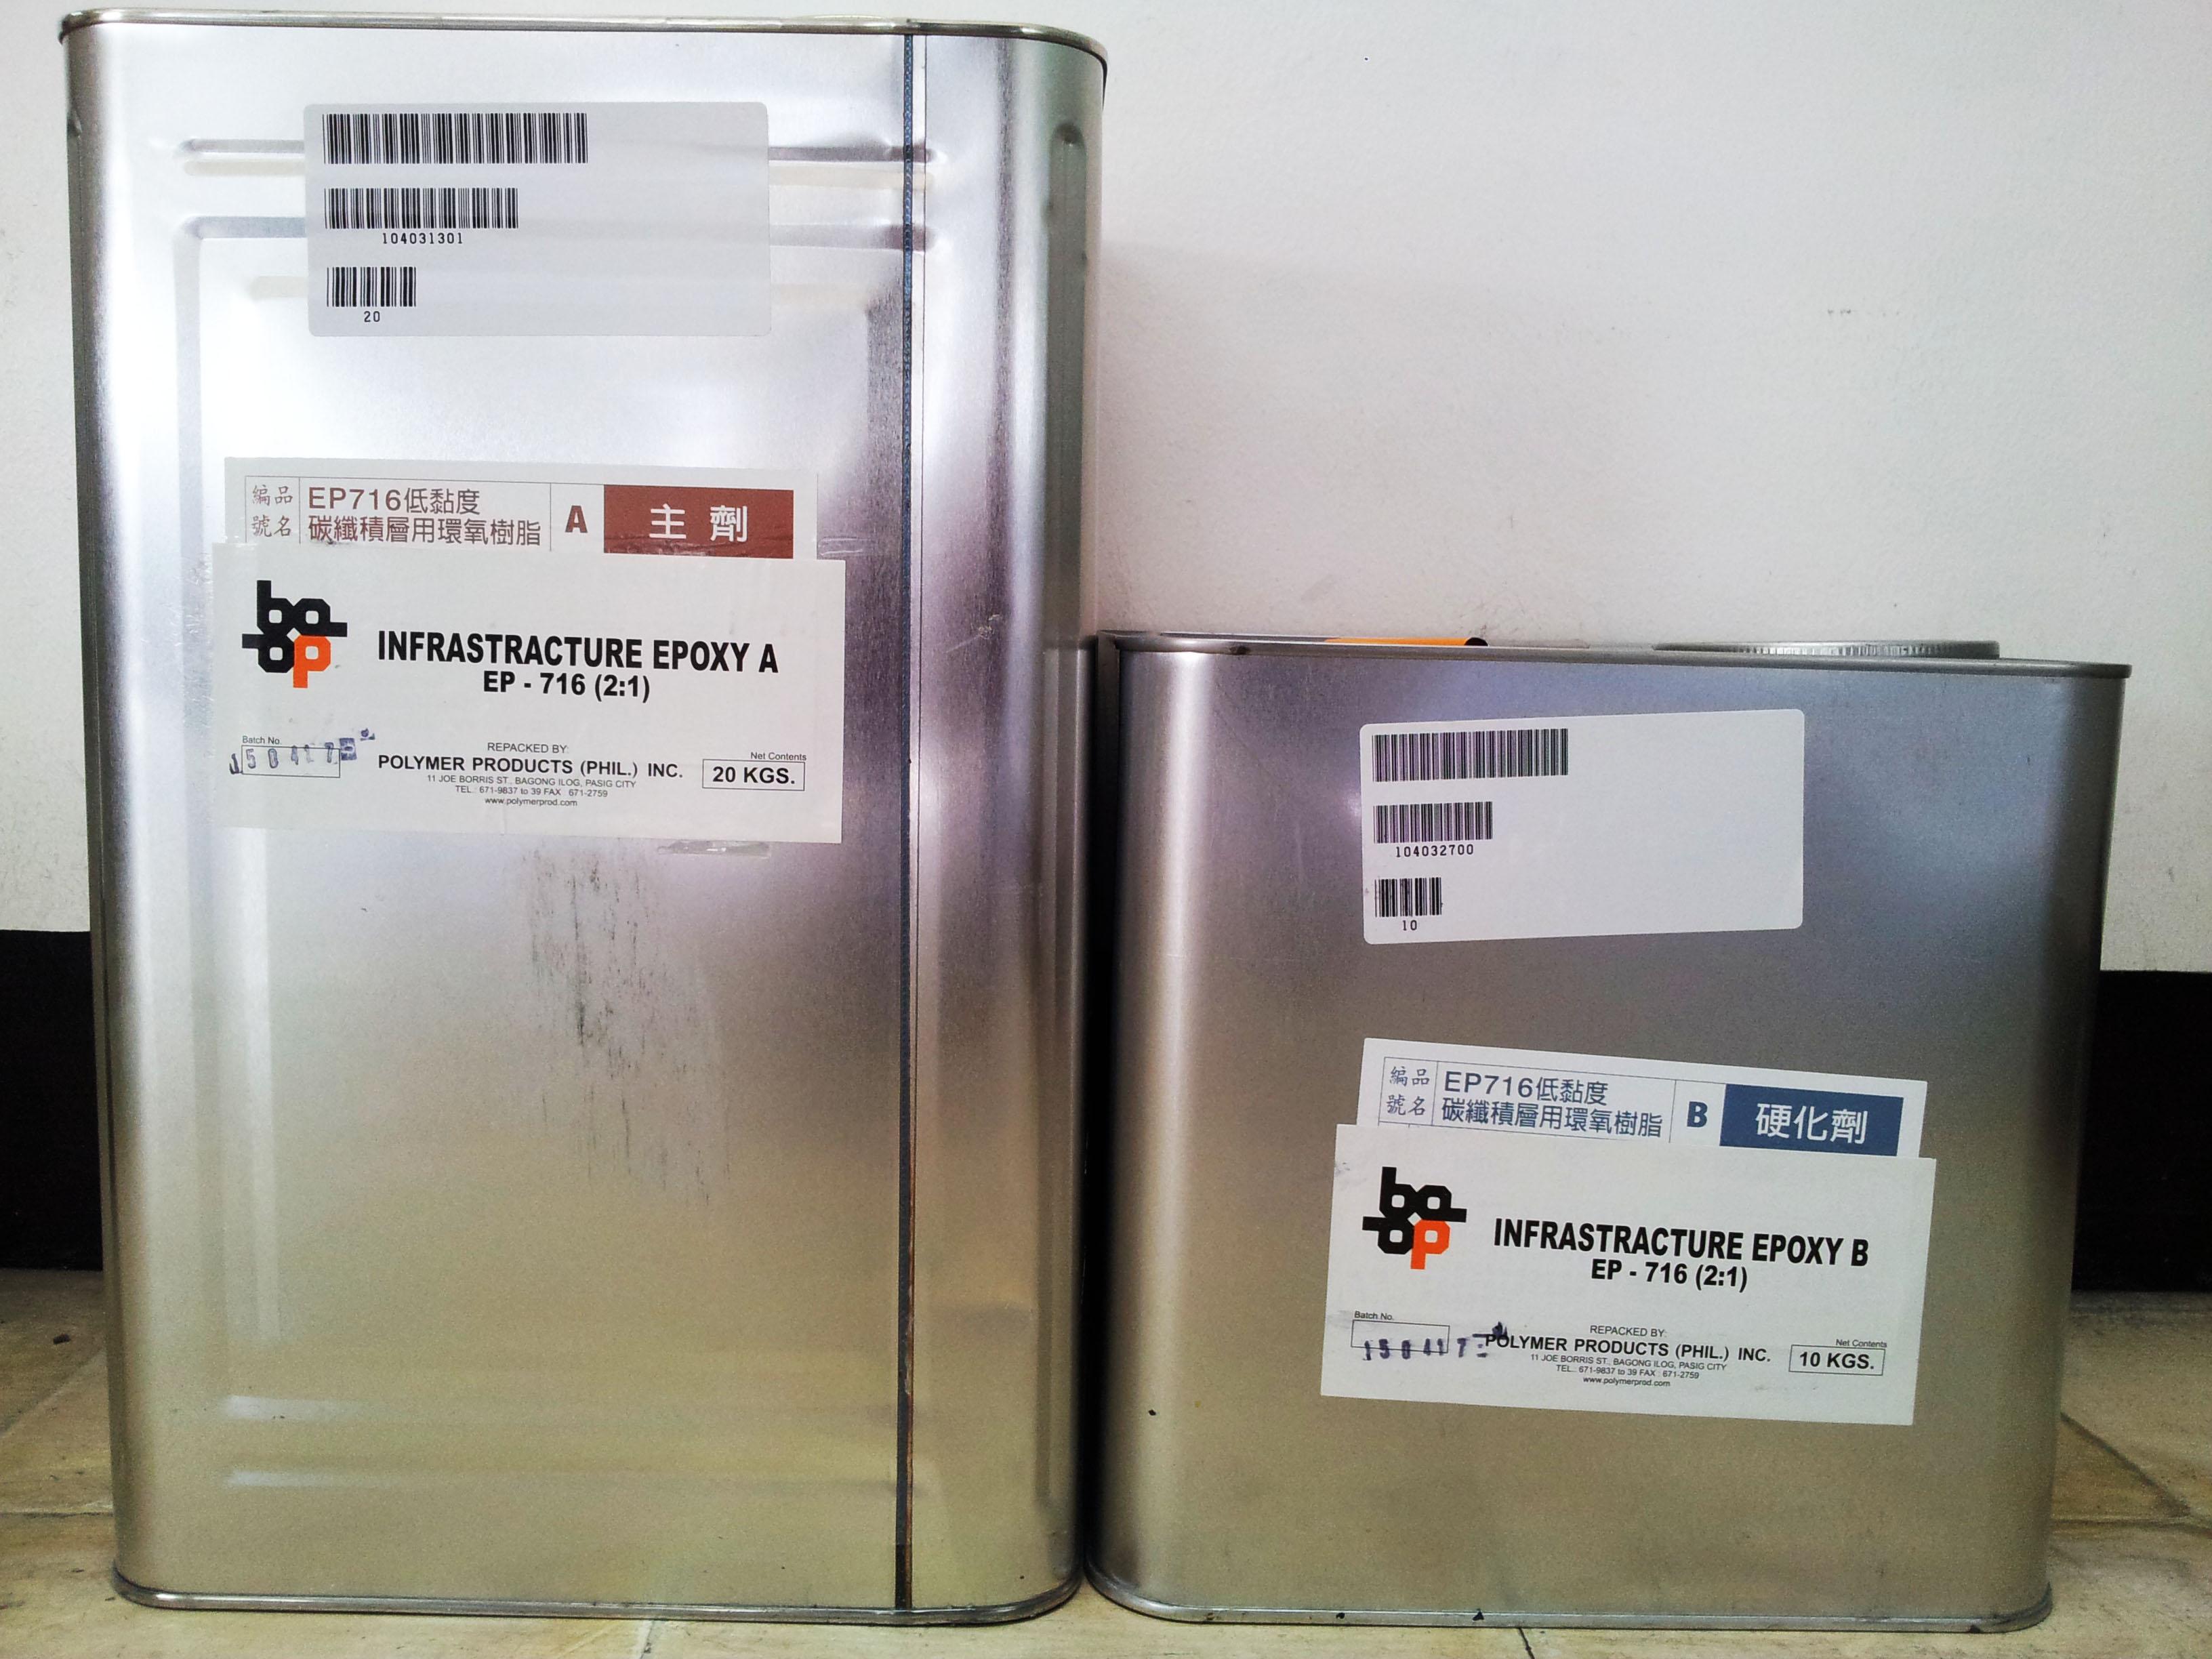 epoxy retrofitting supplies philippines 2